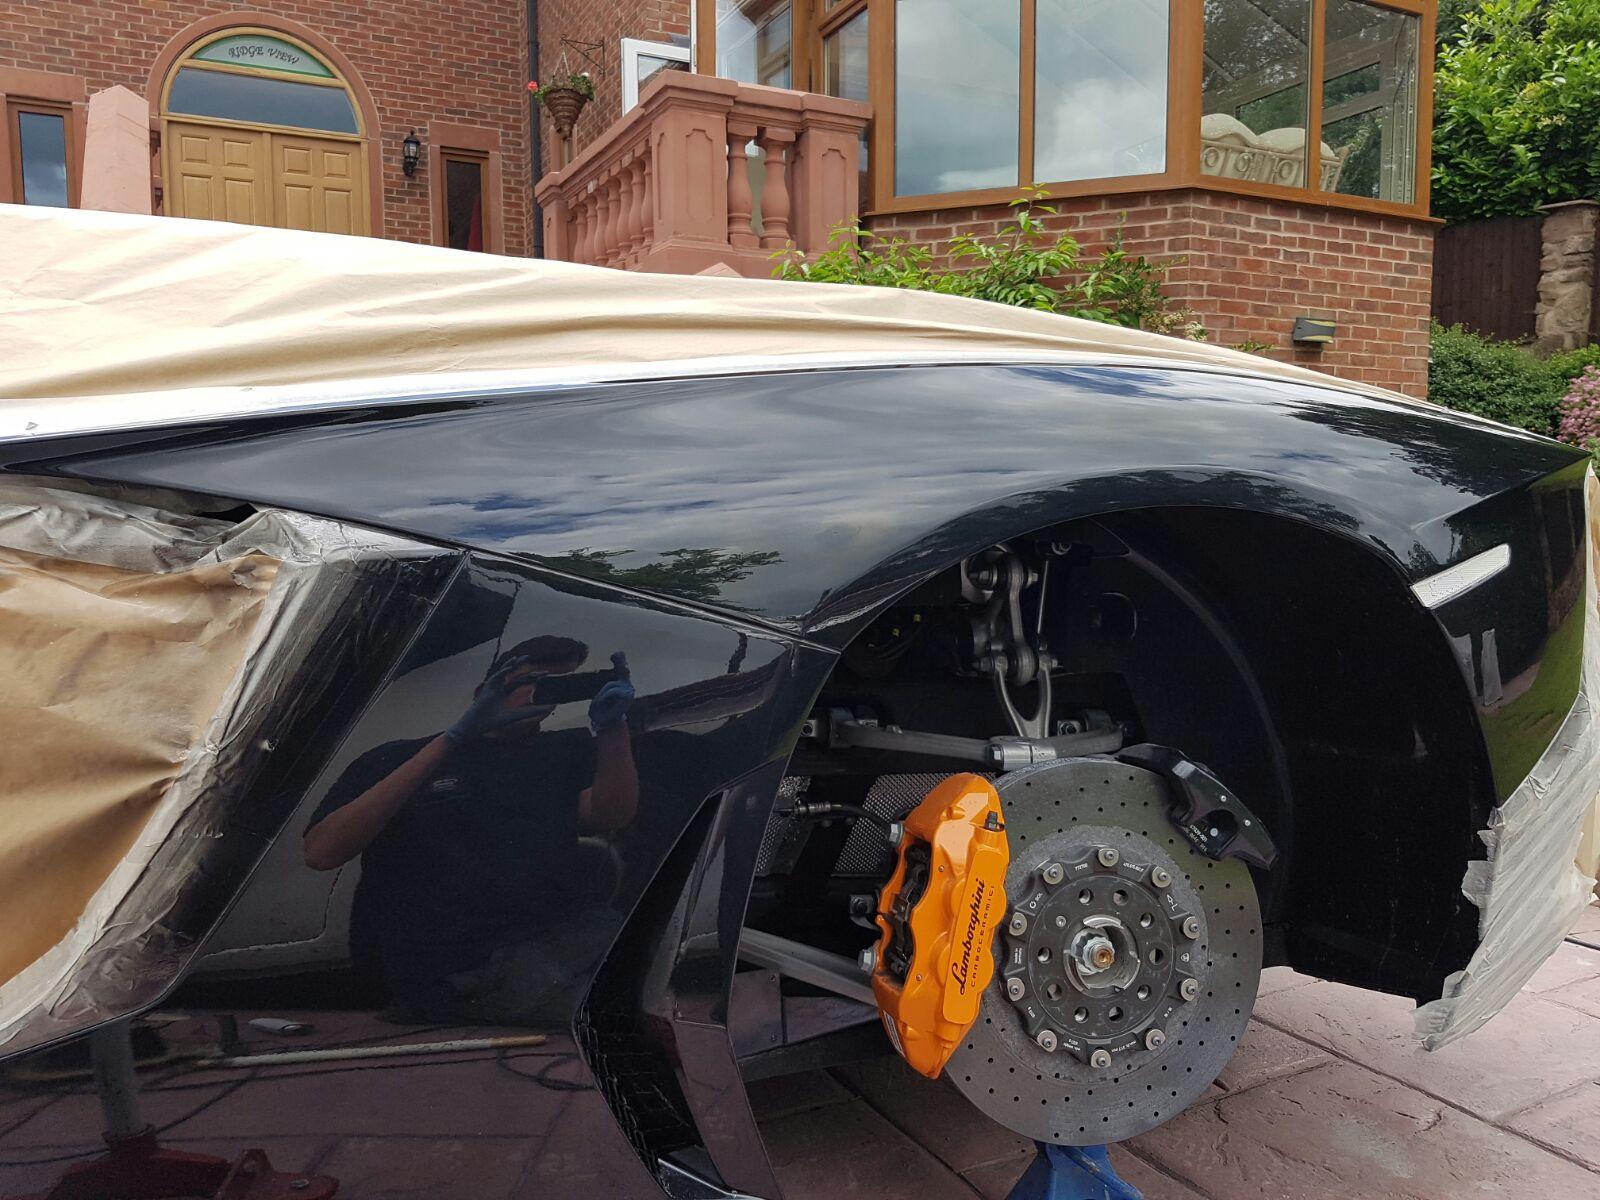 lamborghini aventador mobile car body repair manchester smart auto repairs. Black Bedroom Furniture Sets. Home Design Ideas